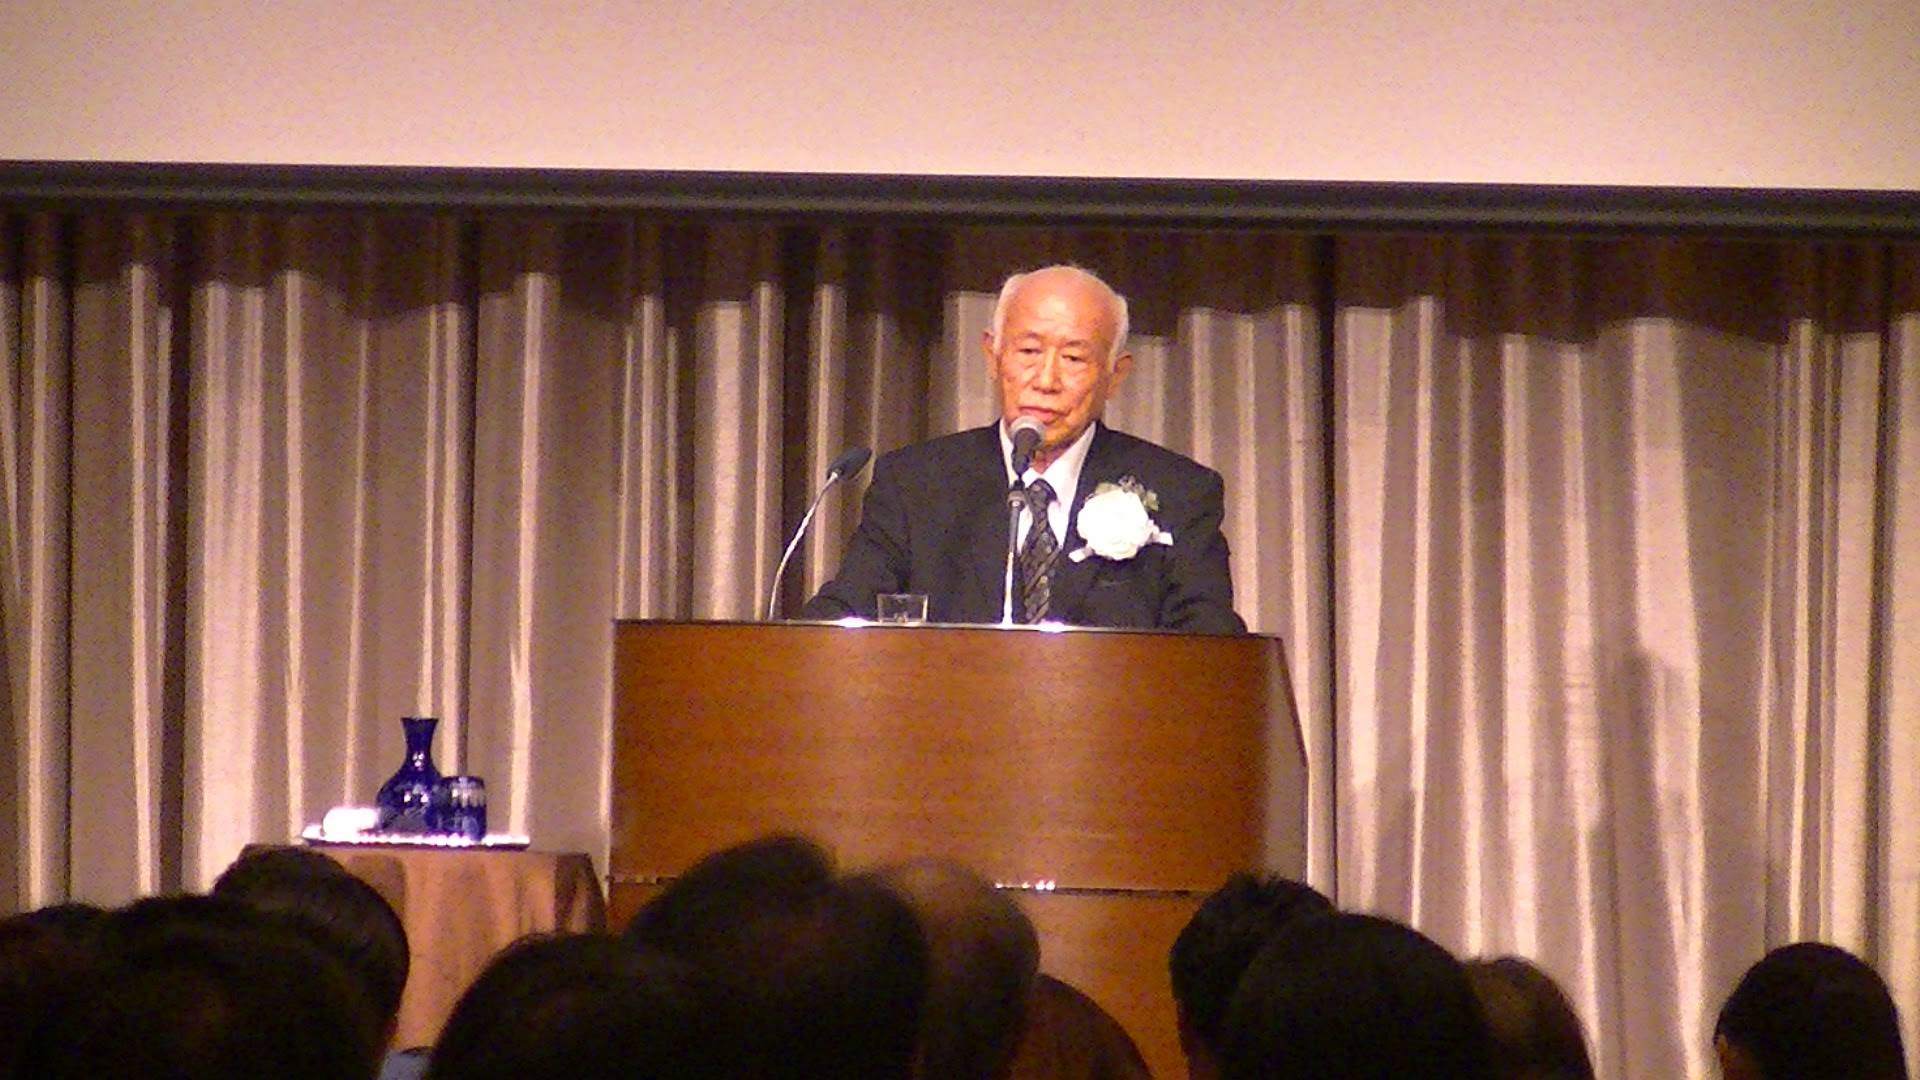 PIC 1731 1 - 思風会全国大会in広島